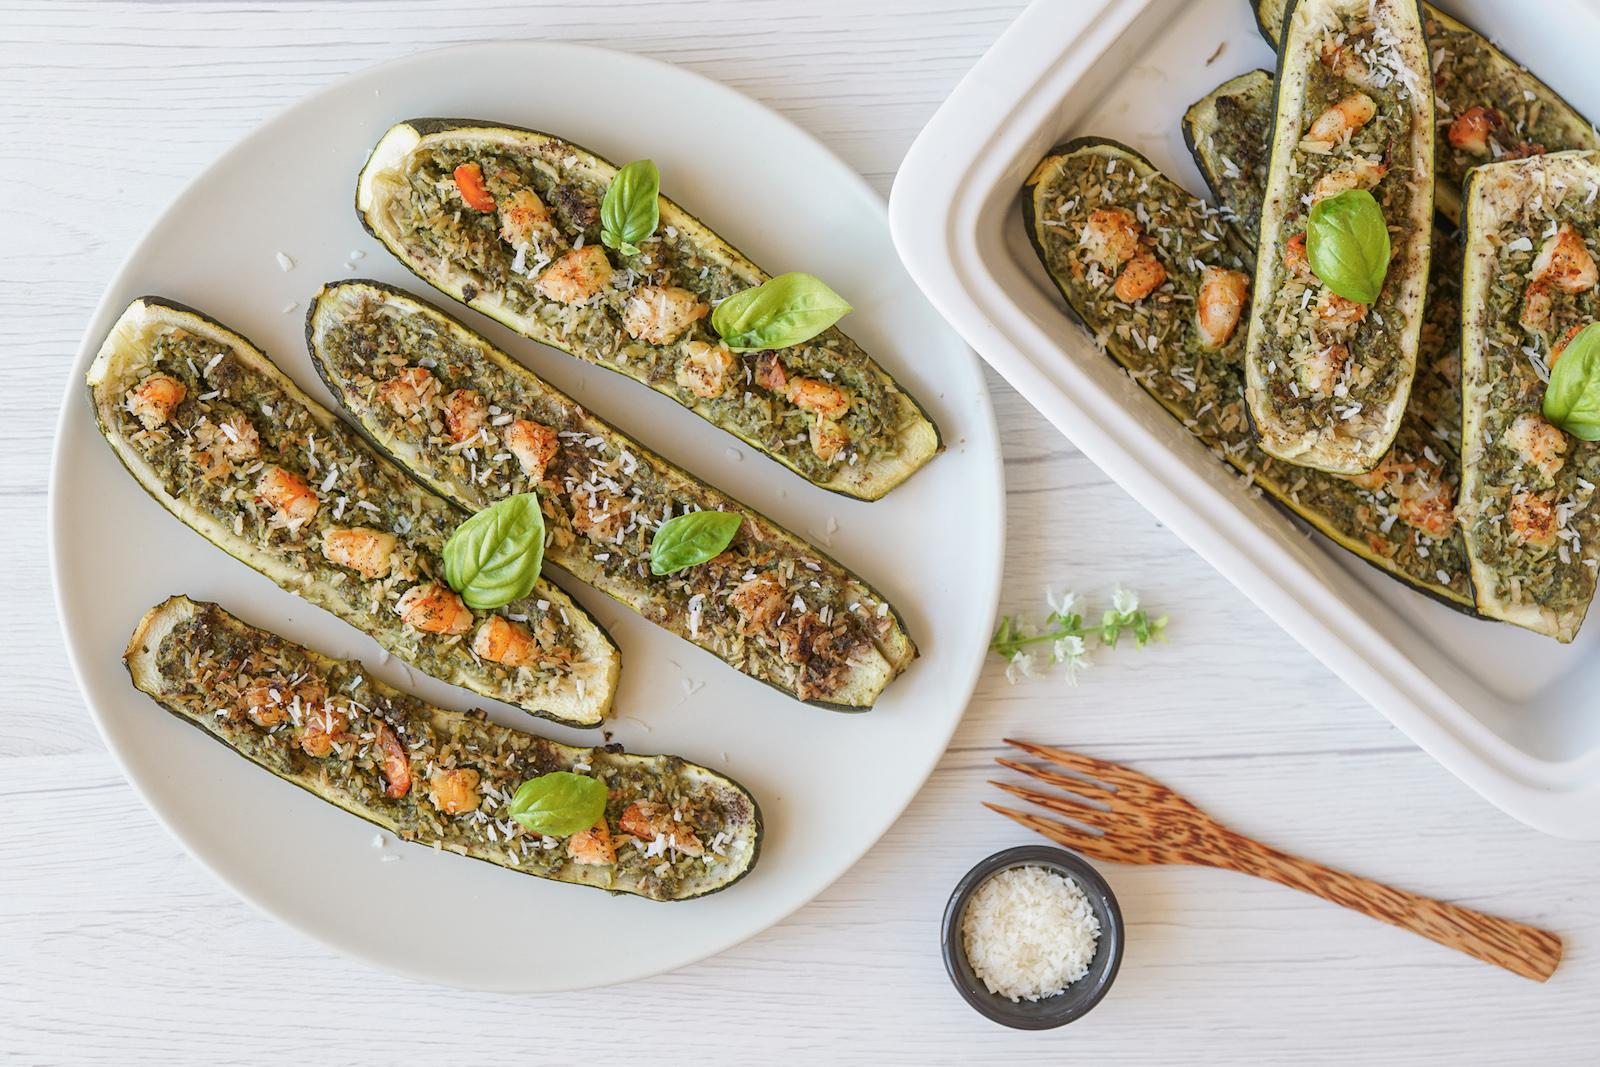 AIP Italian Pesto Scampi Zucchini Boats - AIP Italian Food Recipes from the AIP Italian Cookbook